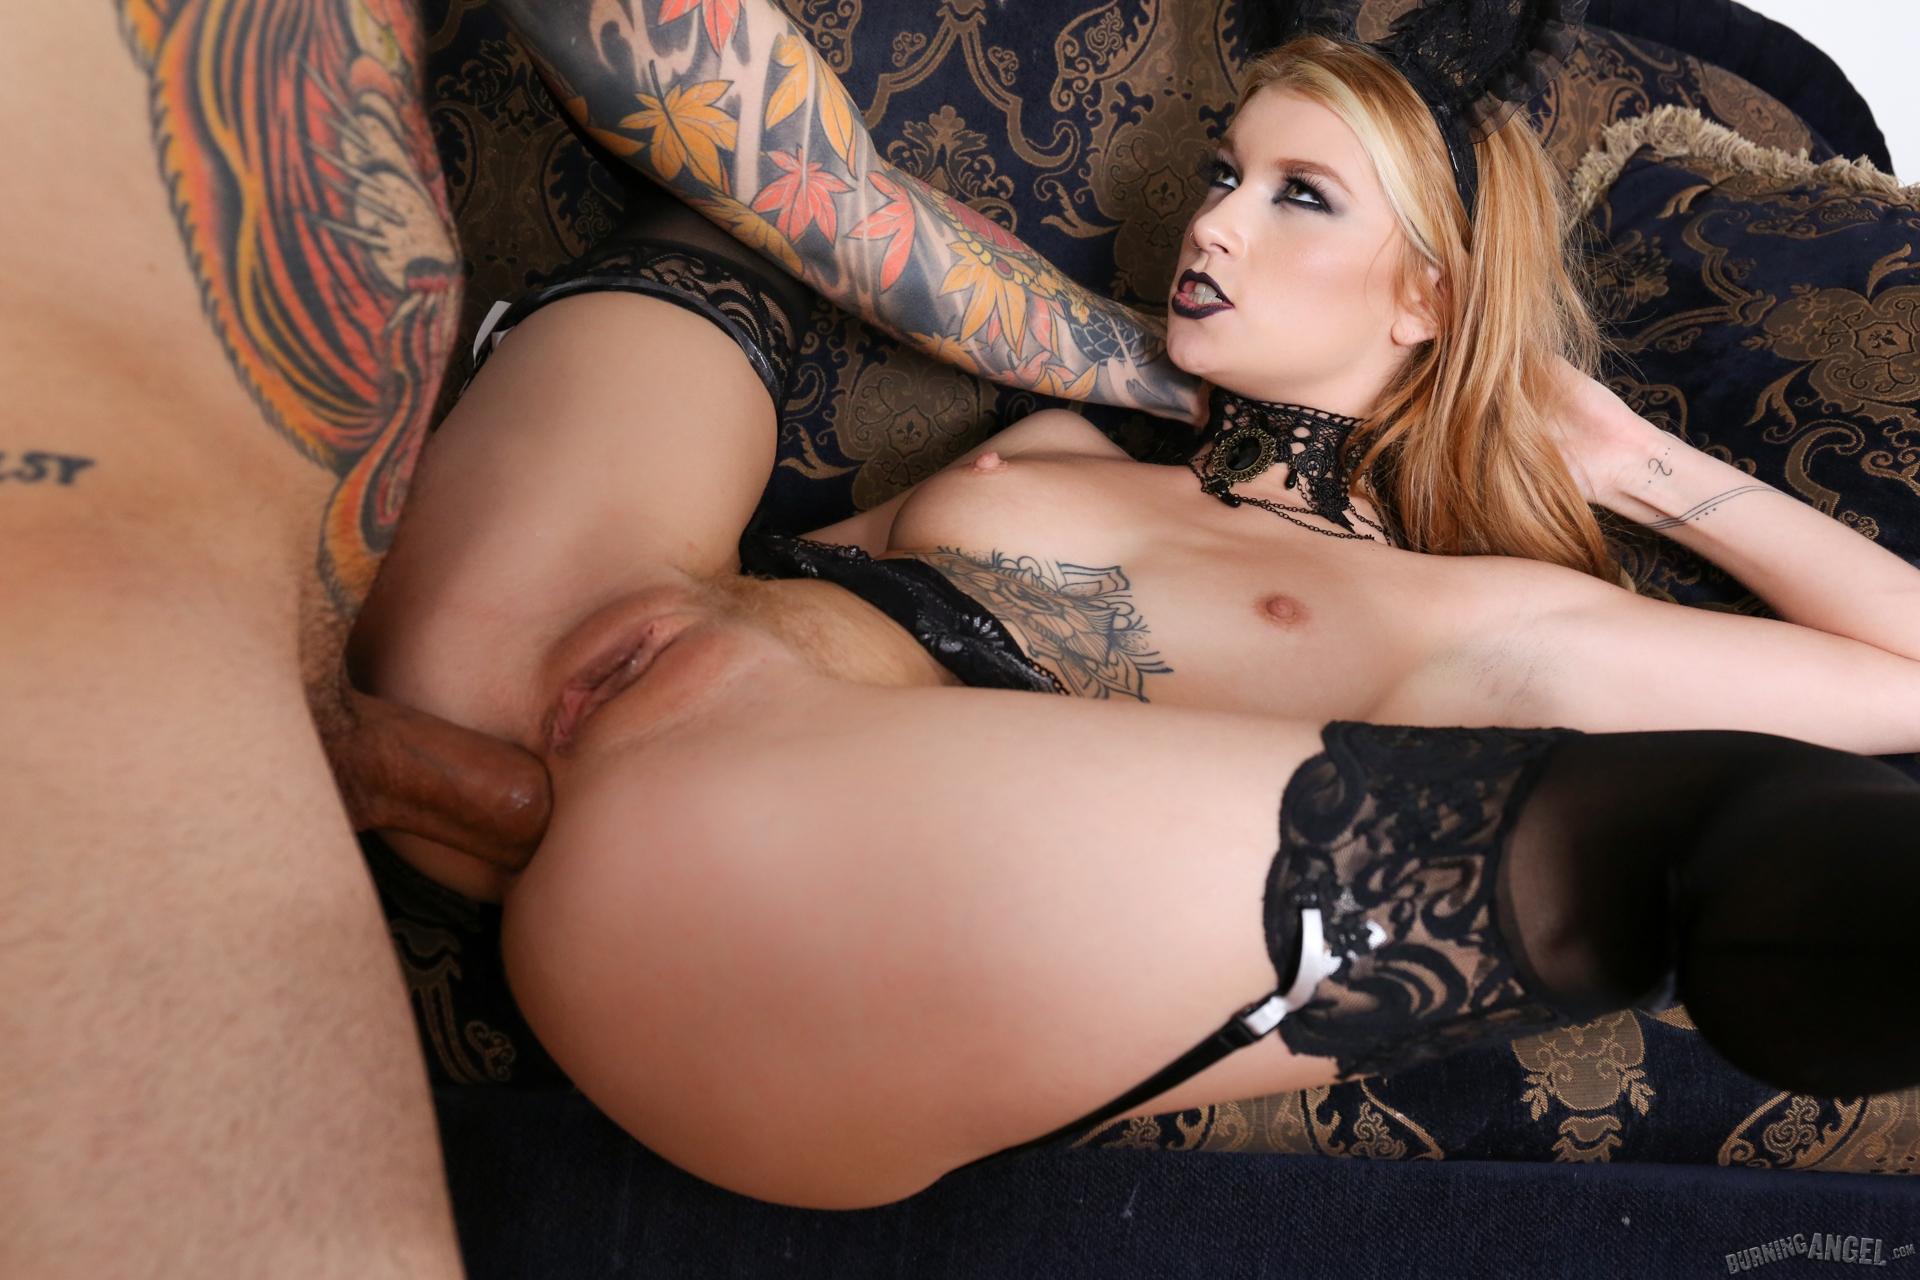 gothic-anal-pics-slut-wear-for-women